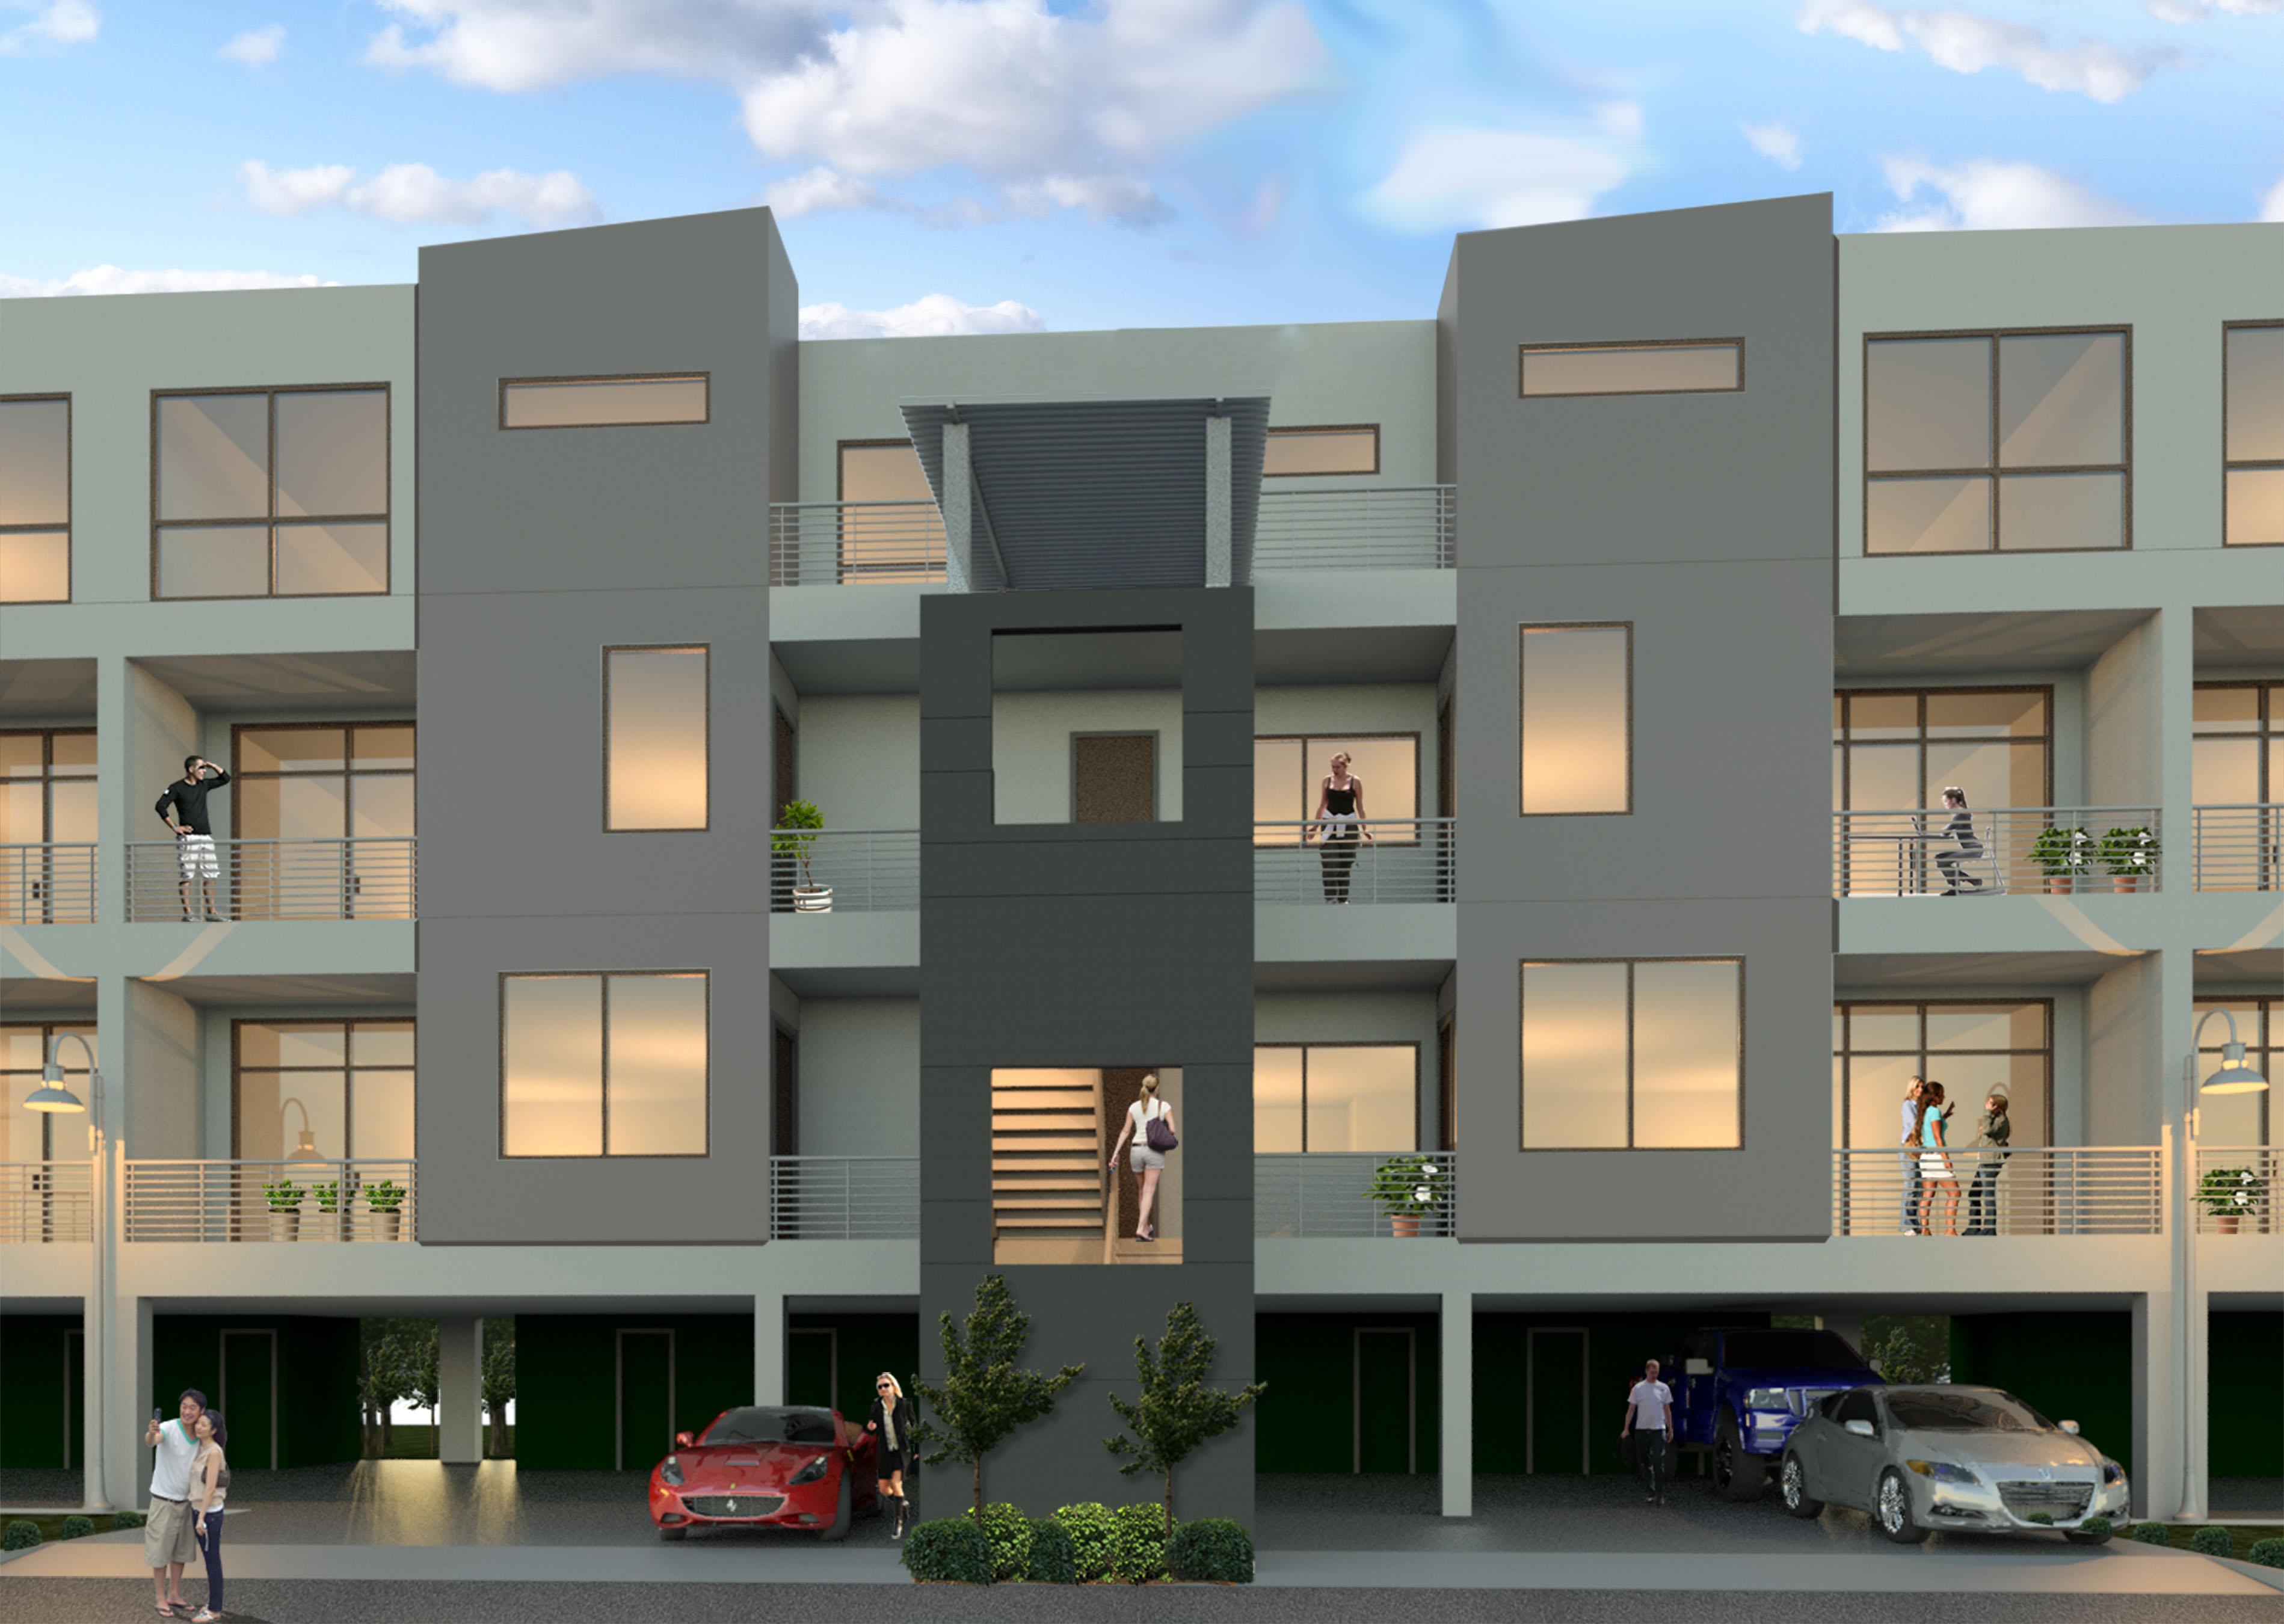 Crawford_-_Building_A.jpg?t=145202840056